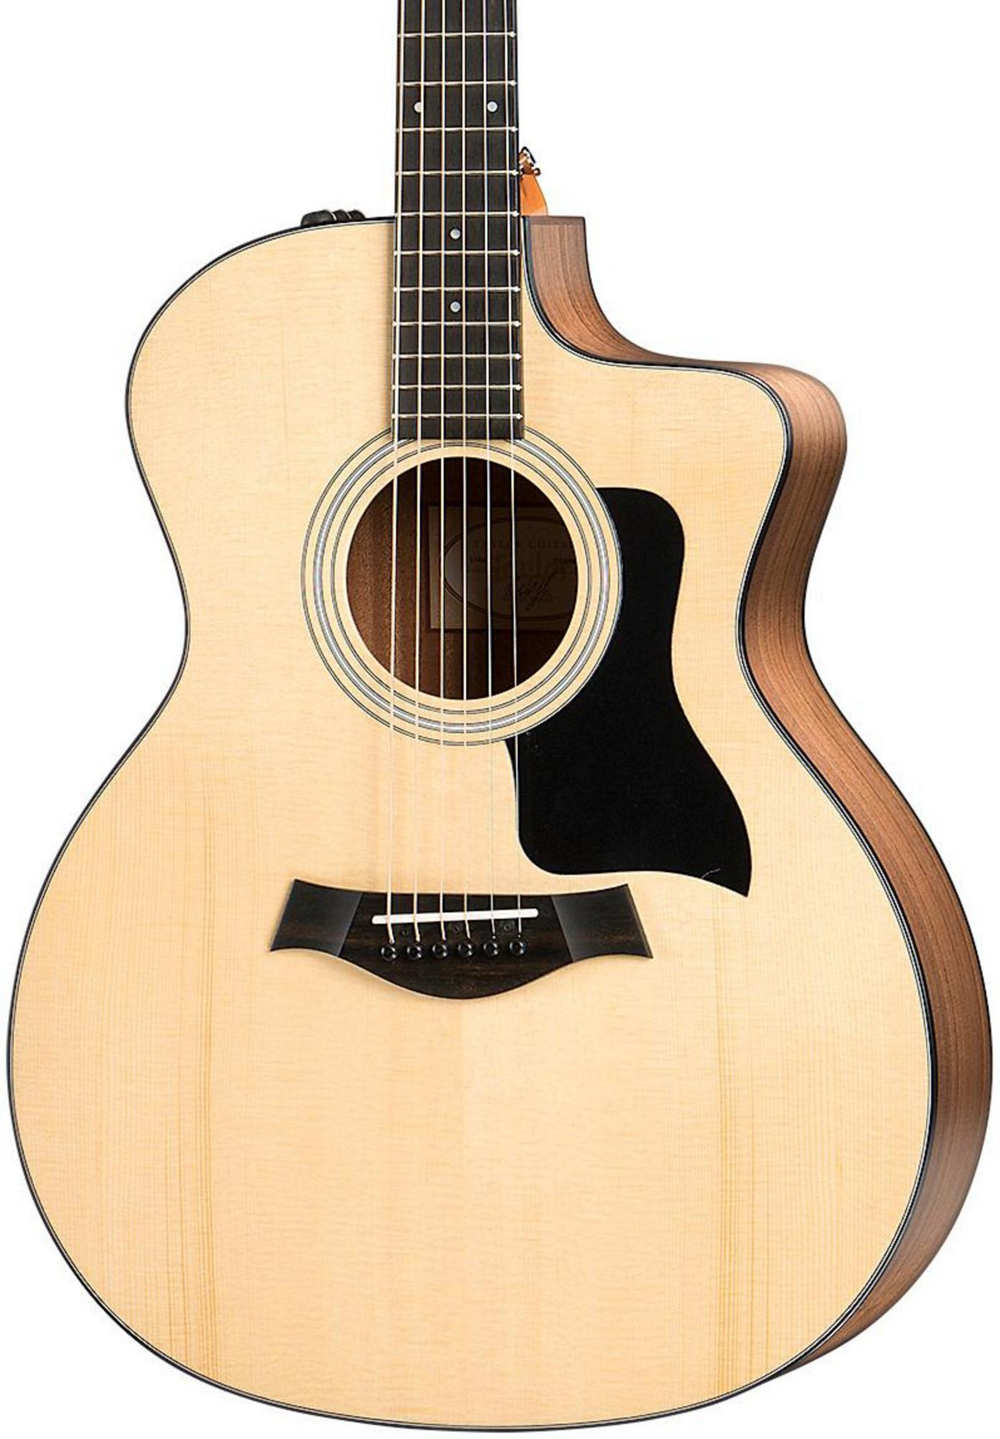 taylor 100 series 2017 114ce grand auditorium acoustic electric guitar natural. Black Bedroom Furniture Sets. Home Design Ideas